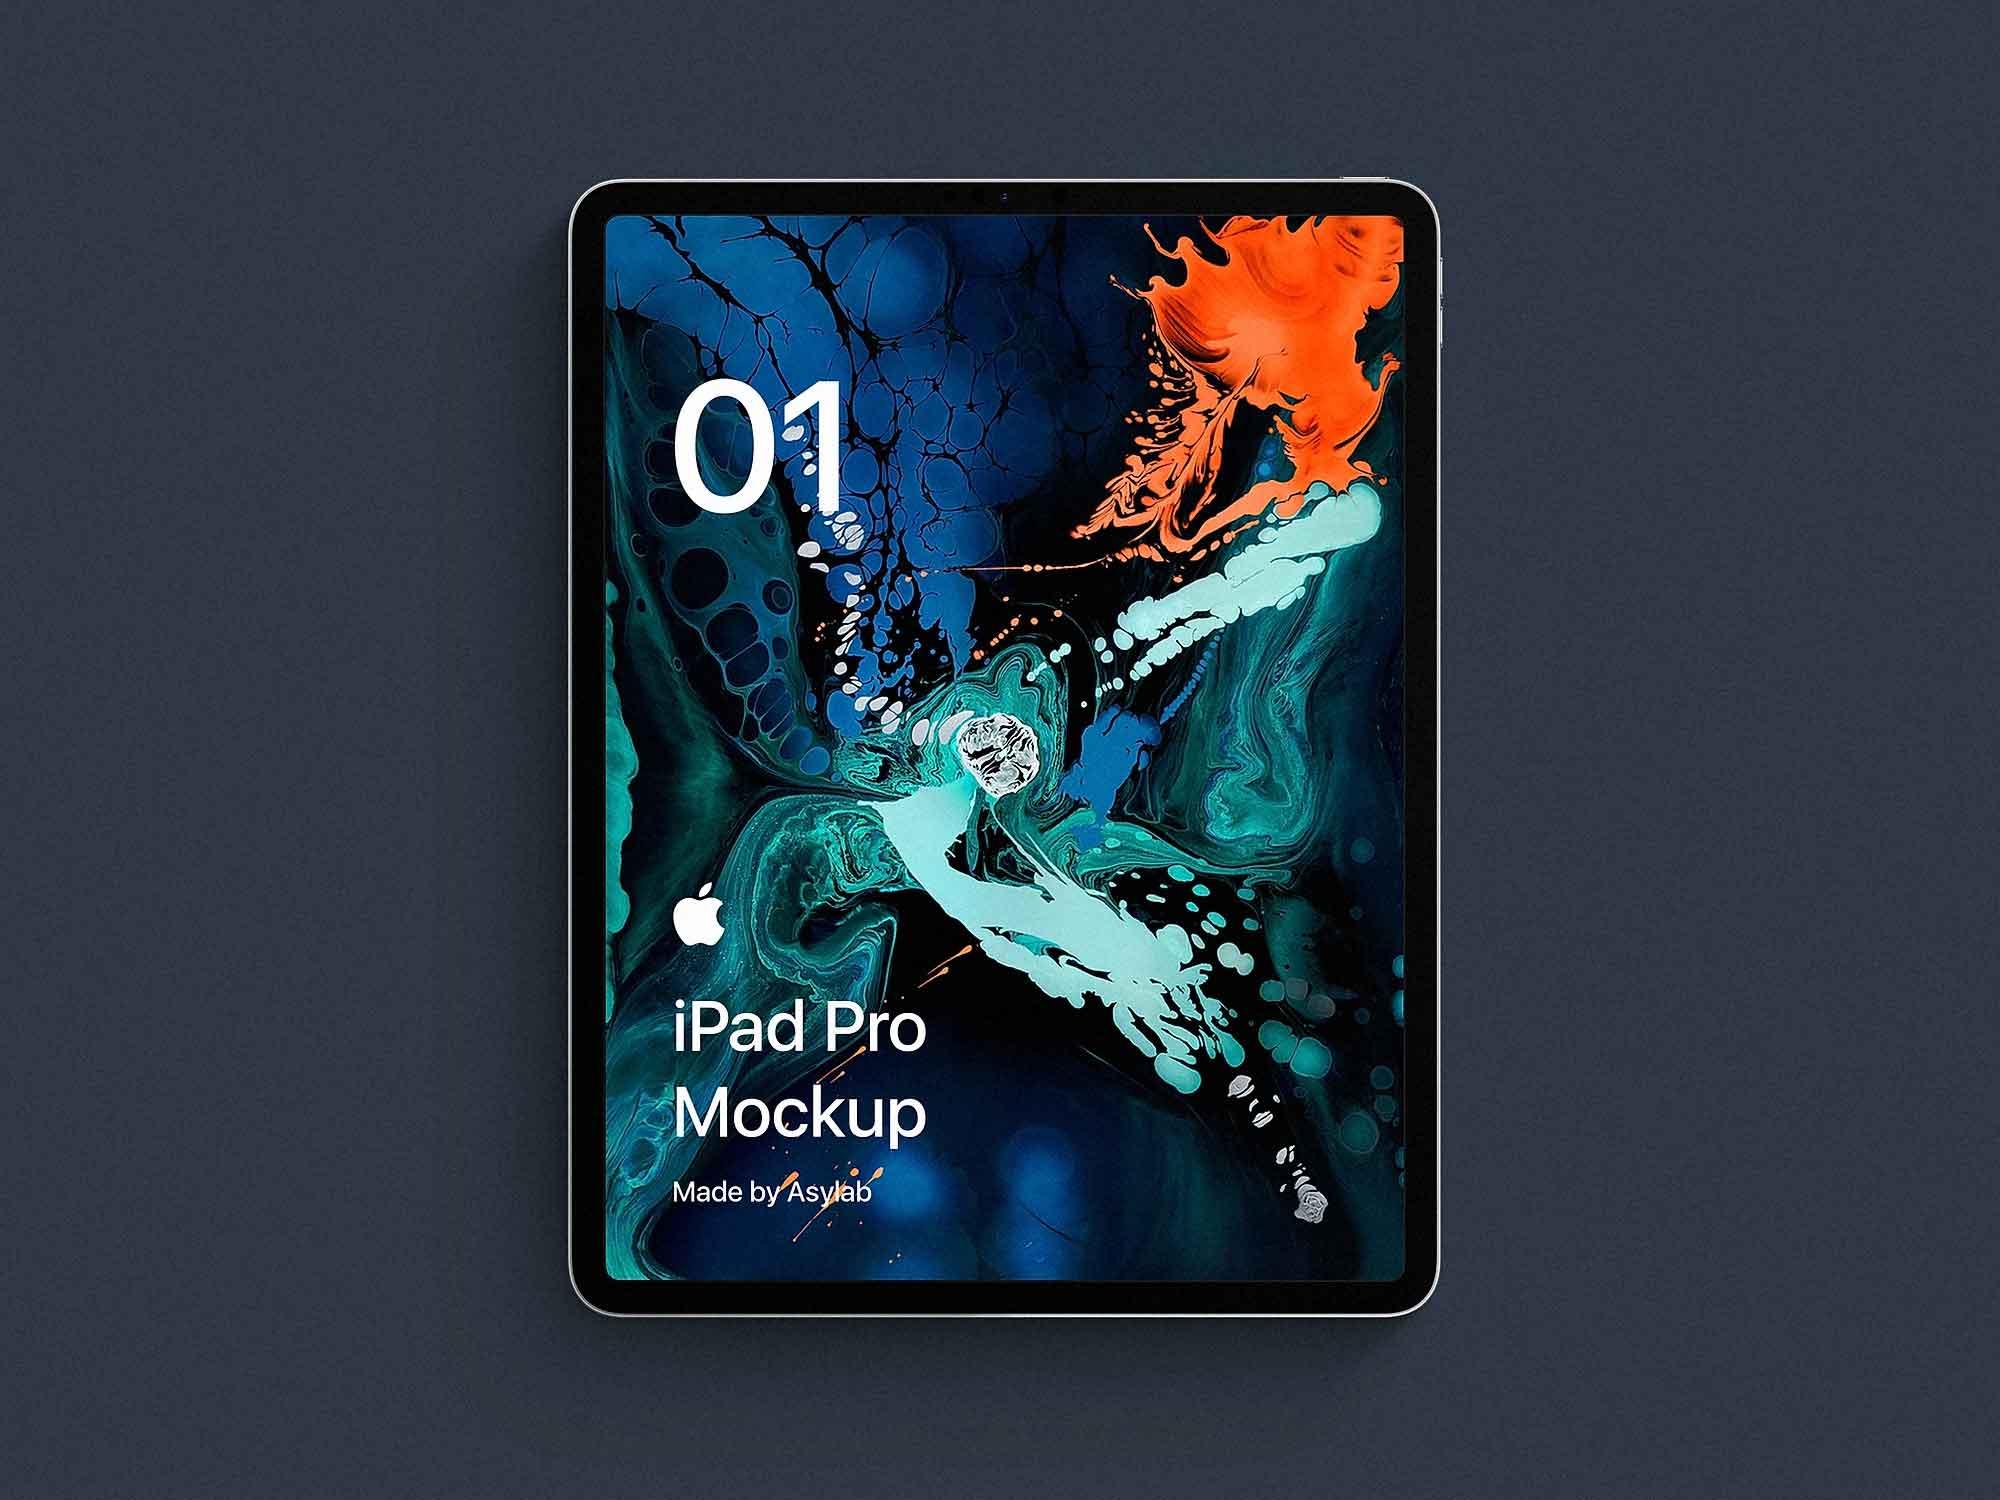 iPad Pro Front Mockup